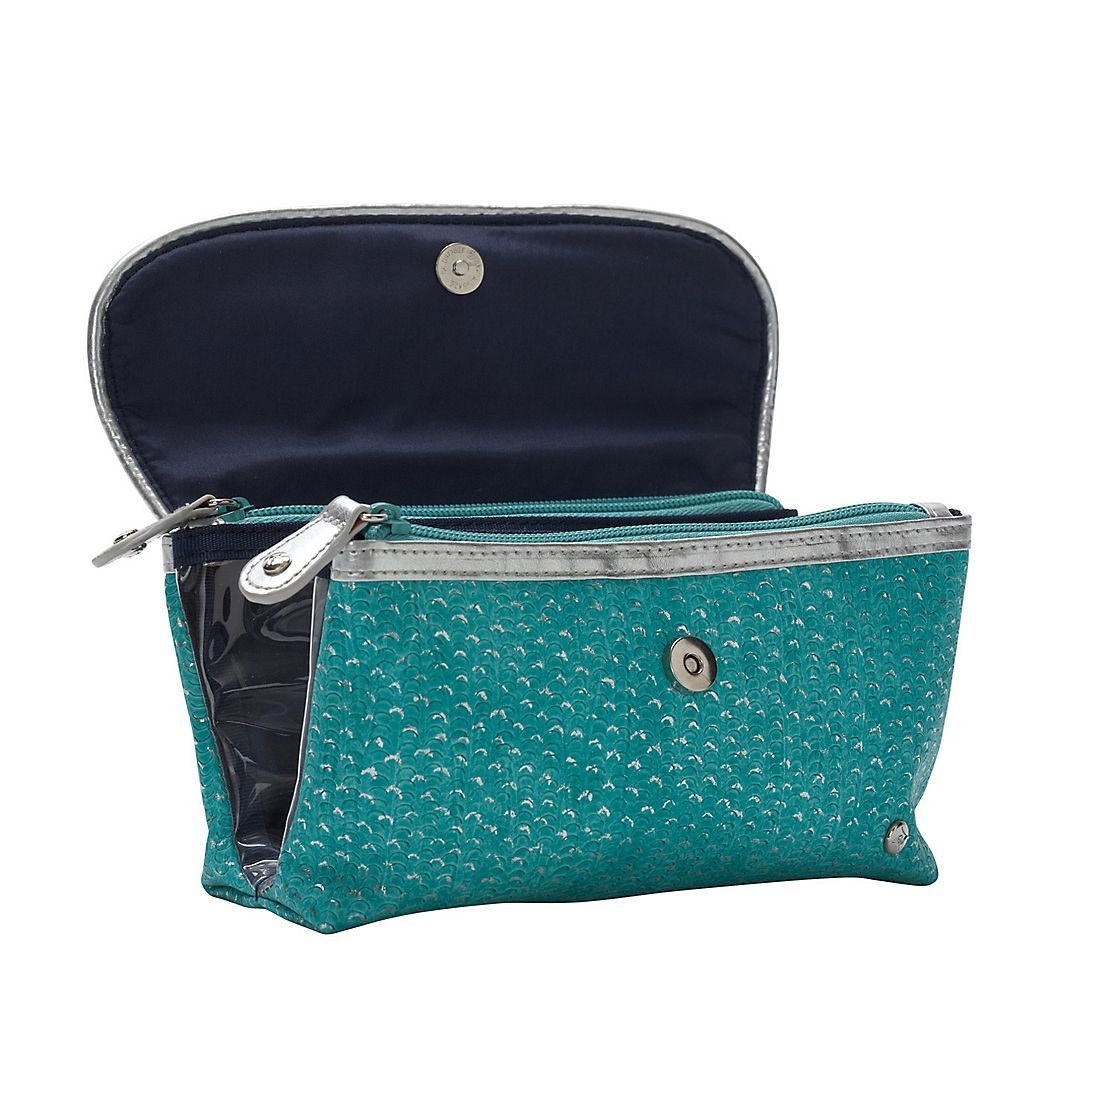 Stephanie Johnson, Laguna Katie Folding Cosmetic Bag in